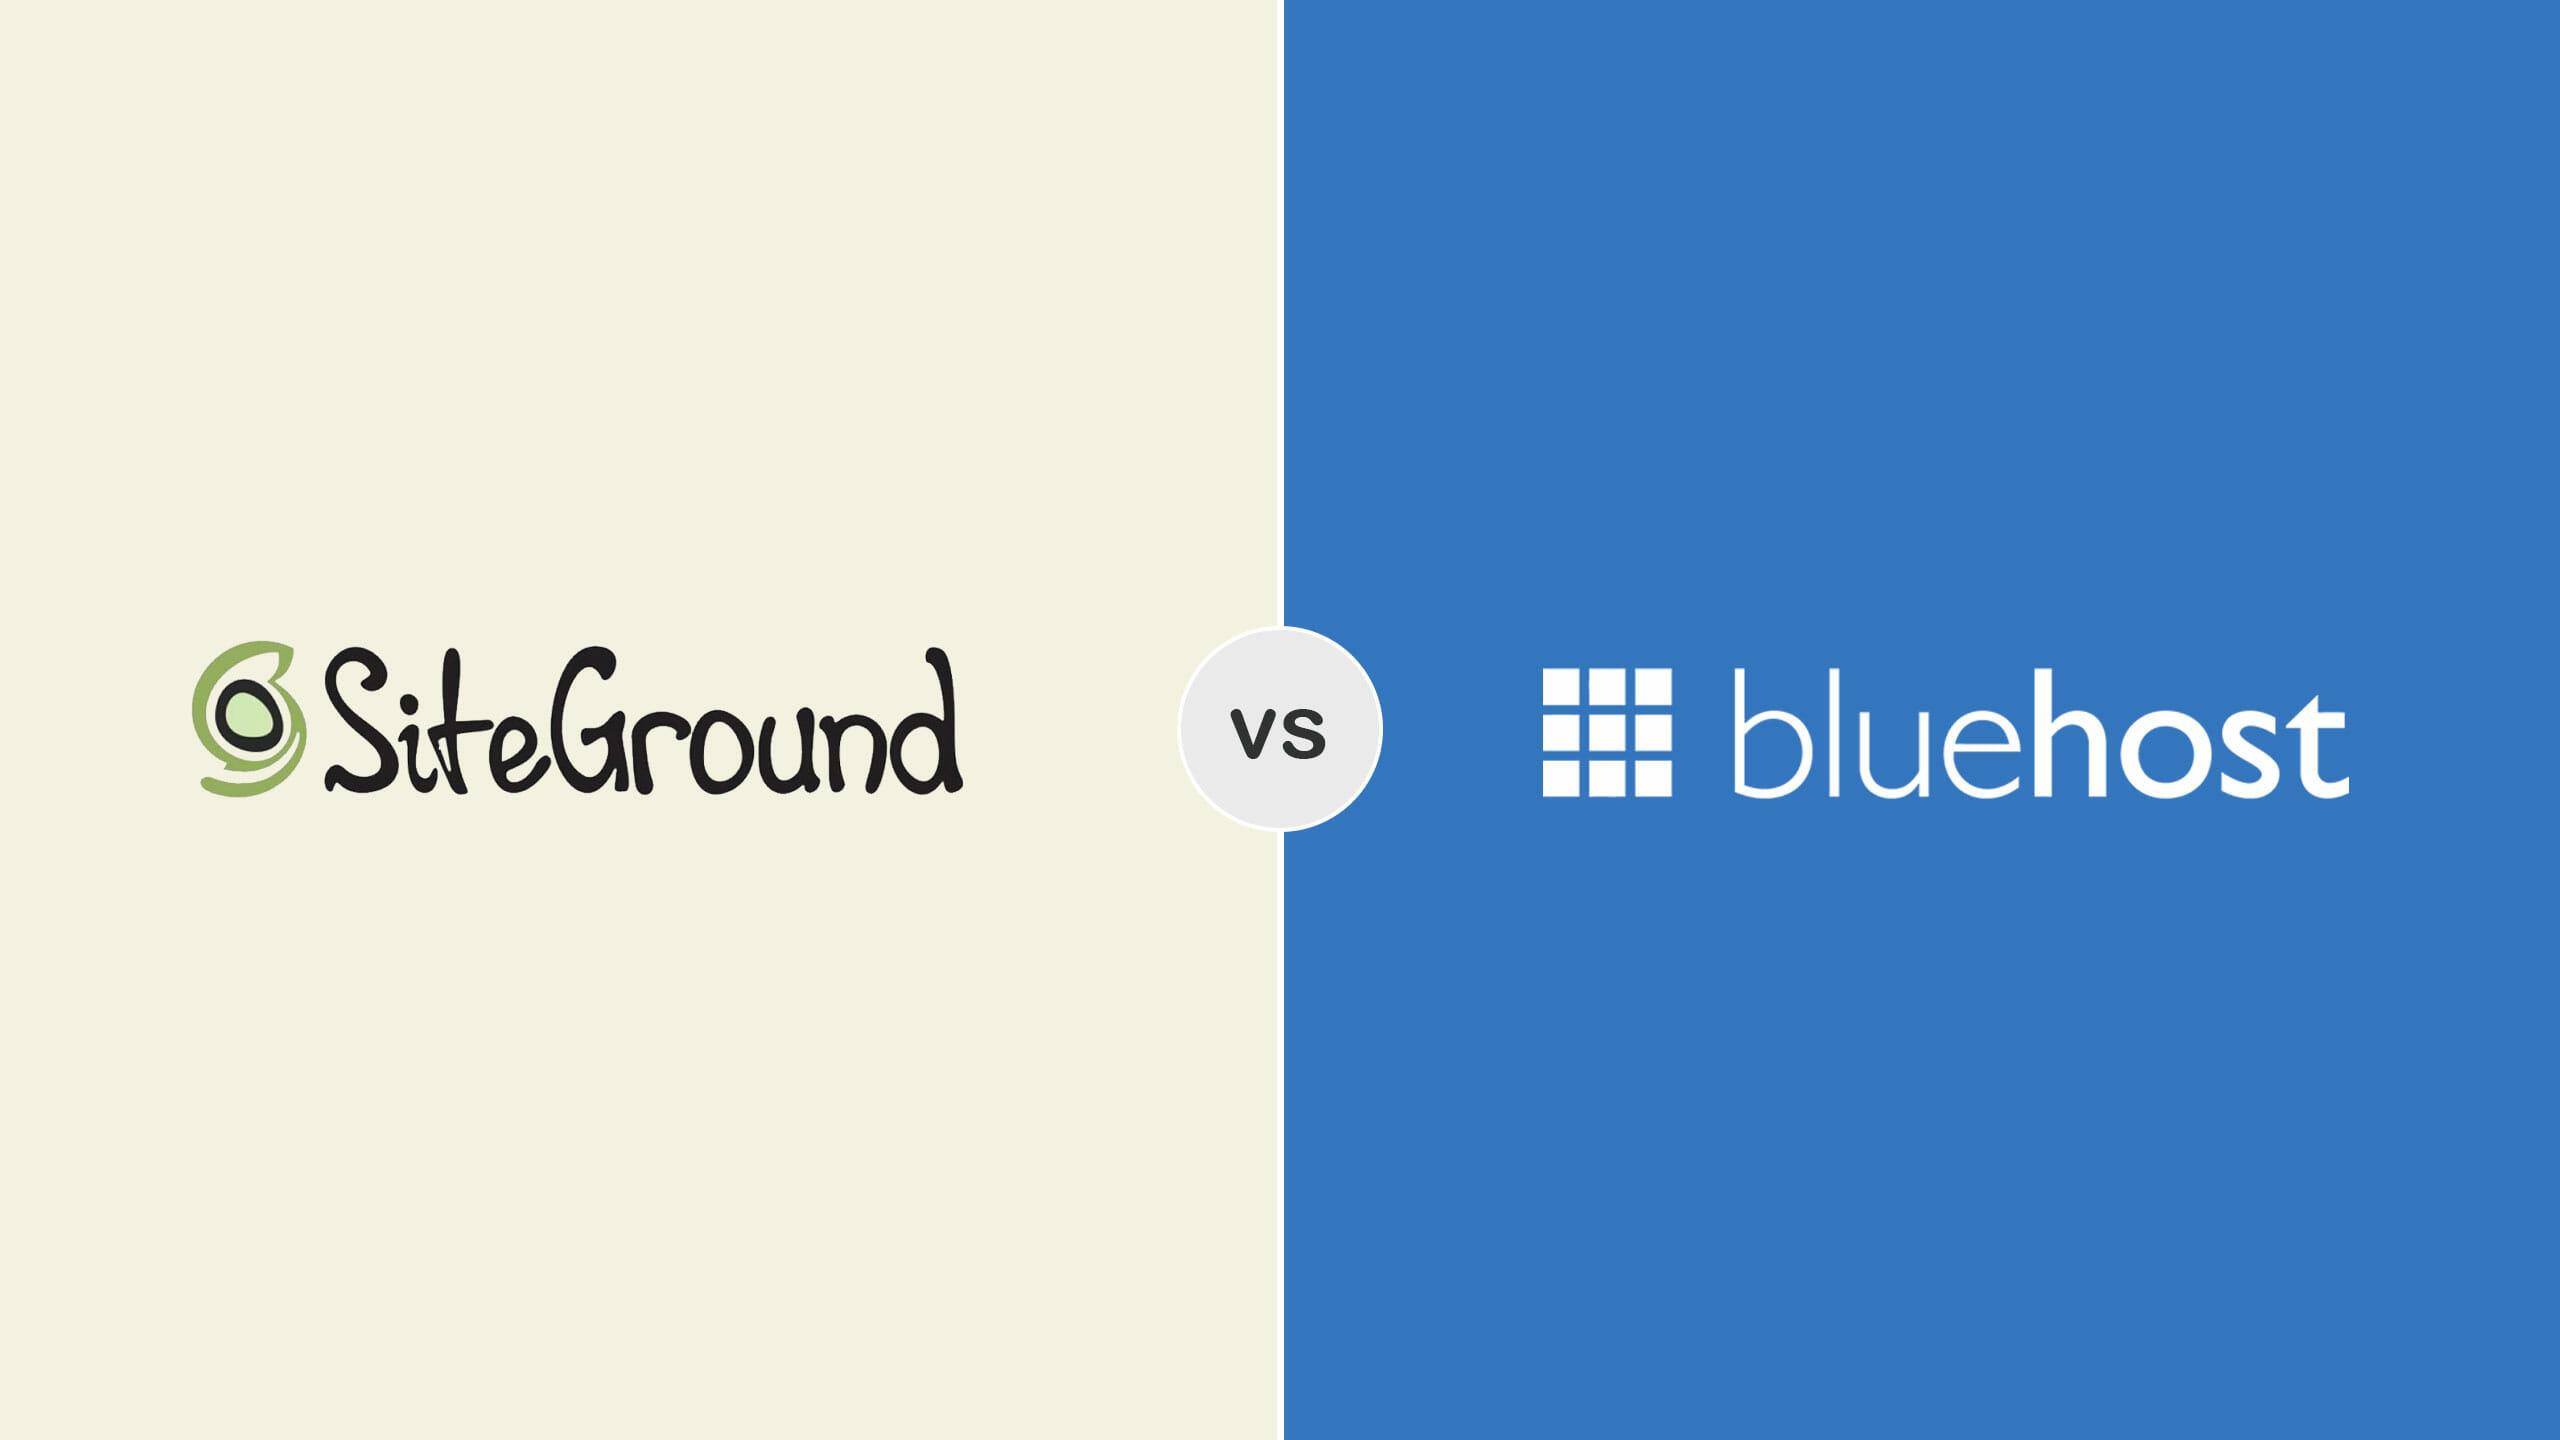 Bluehost vs Siteground Screenshots